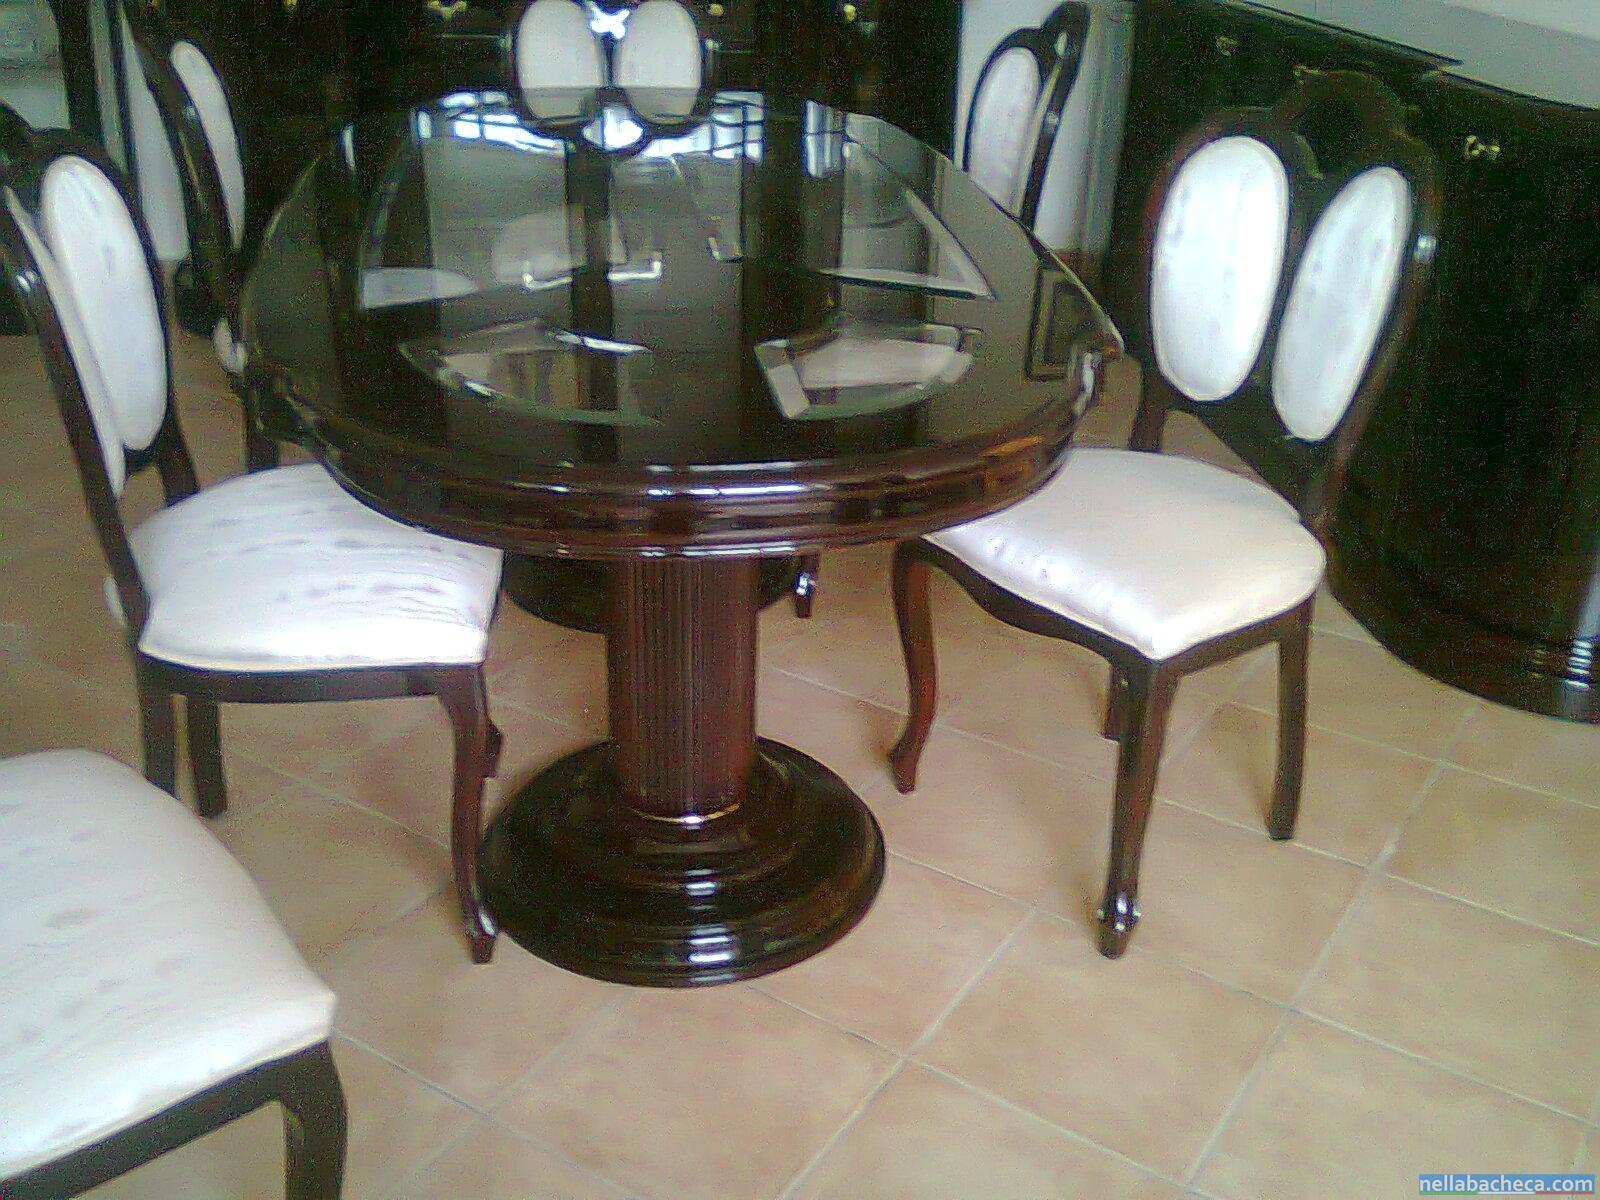 Sala da pranzo stile inglese sicilia carini tutto for Sala da pranzo traduzione inglese